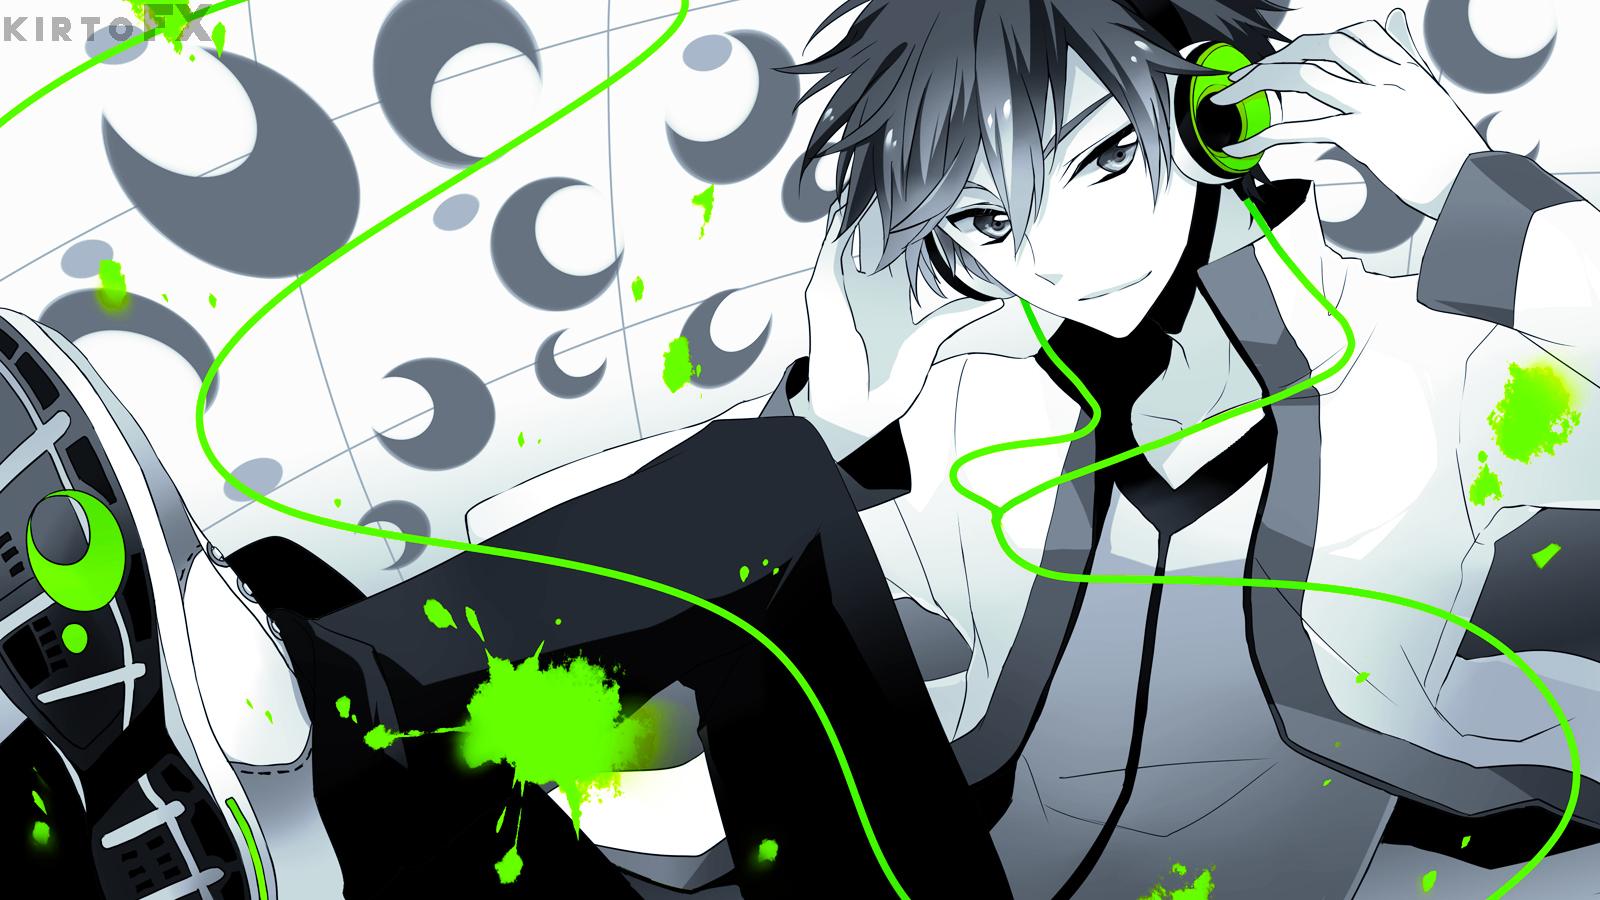 Anime wallpaper modern boy by kirtofx on deviantart - Anime gamer boy ...